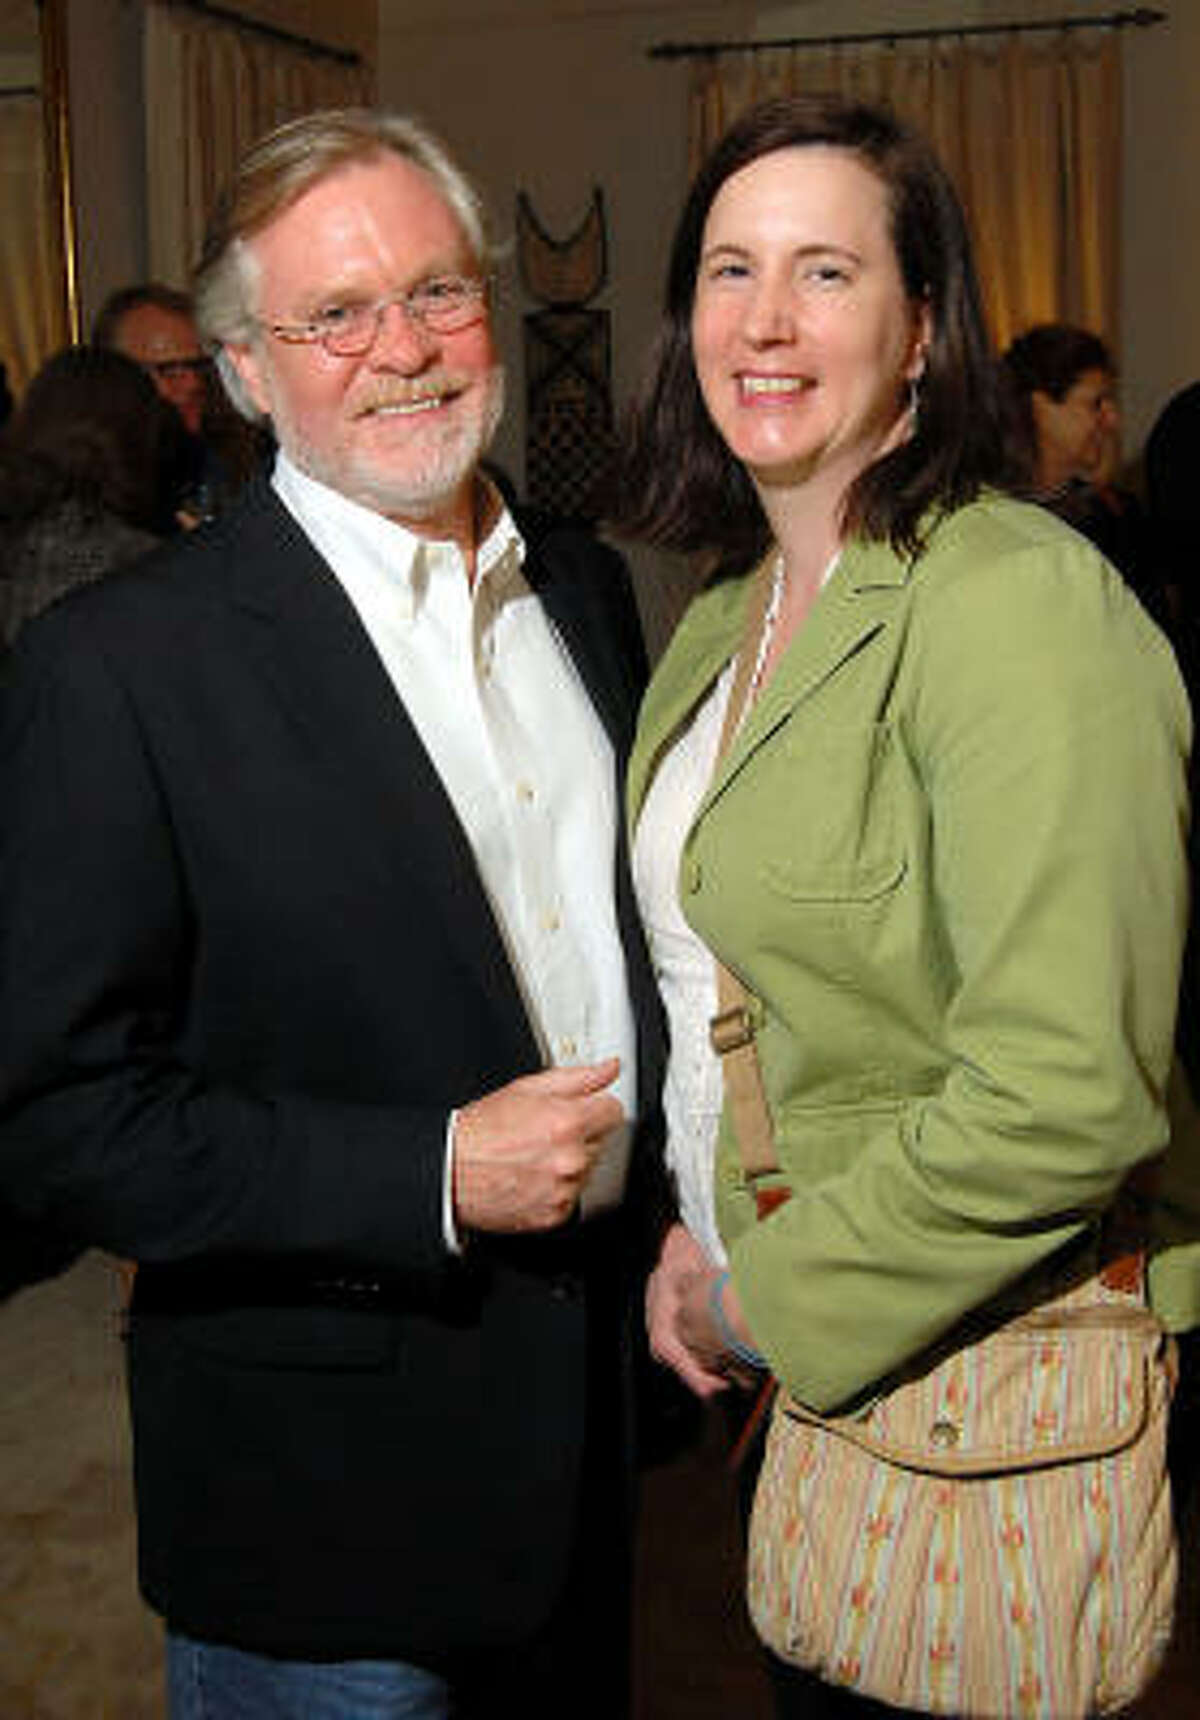 Rick Ferguson and Carla Click